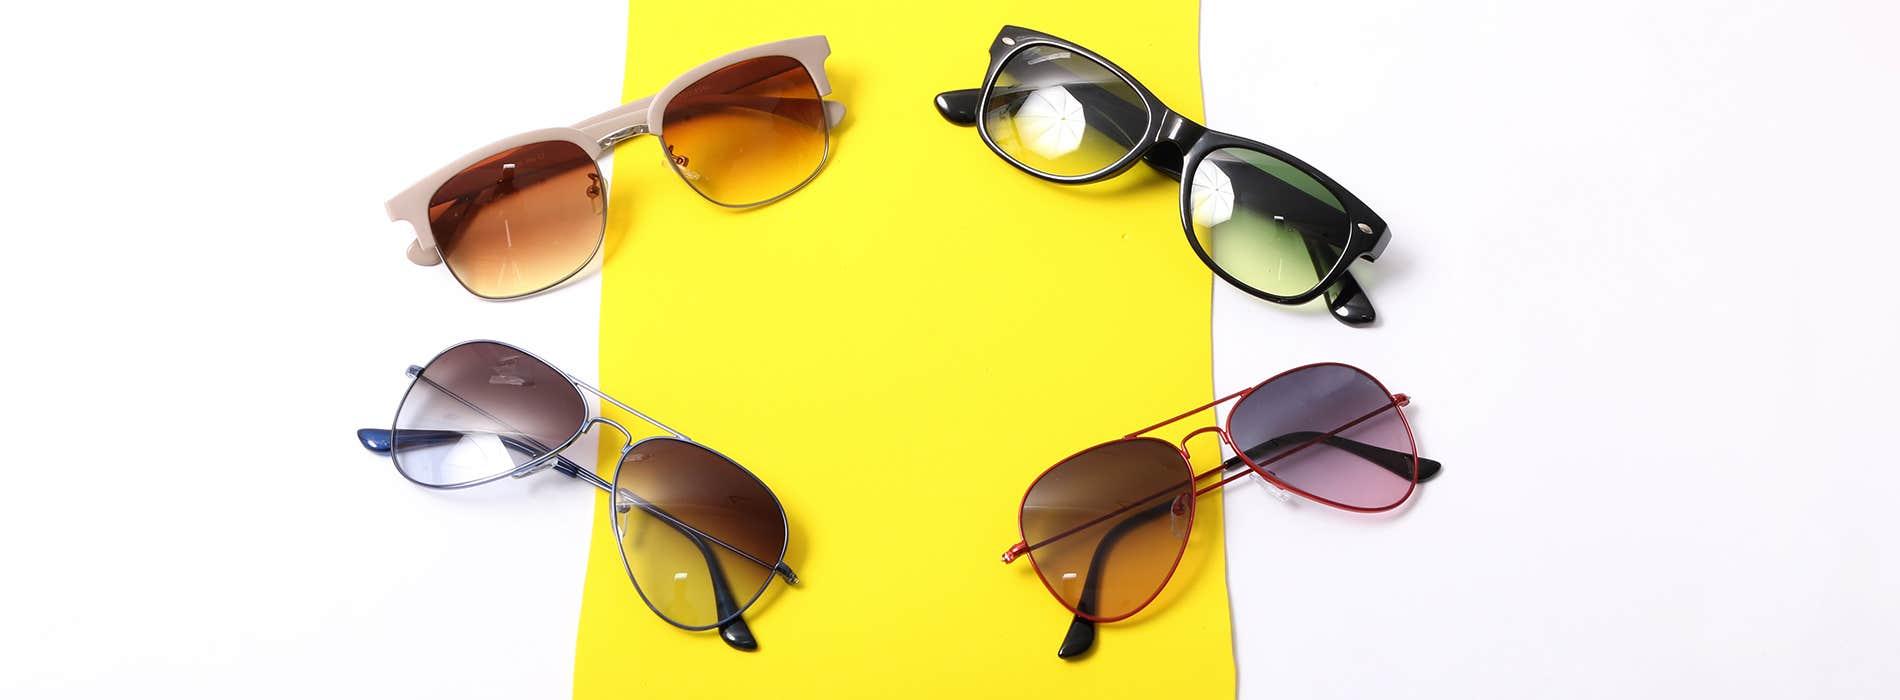 Buy Sunglasses at Eyeglasses.PK